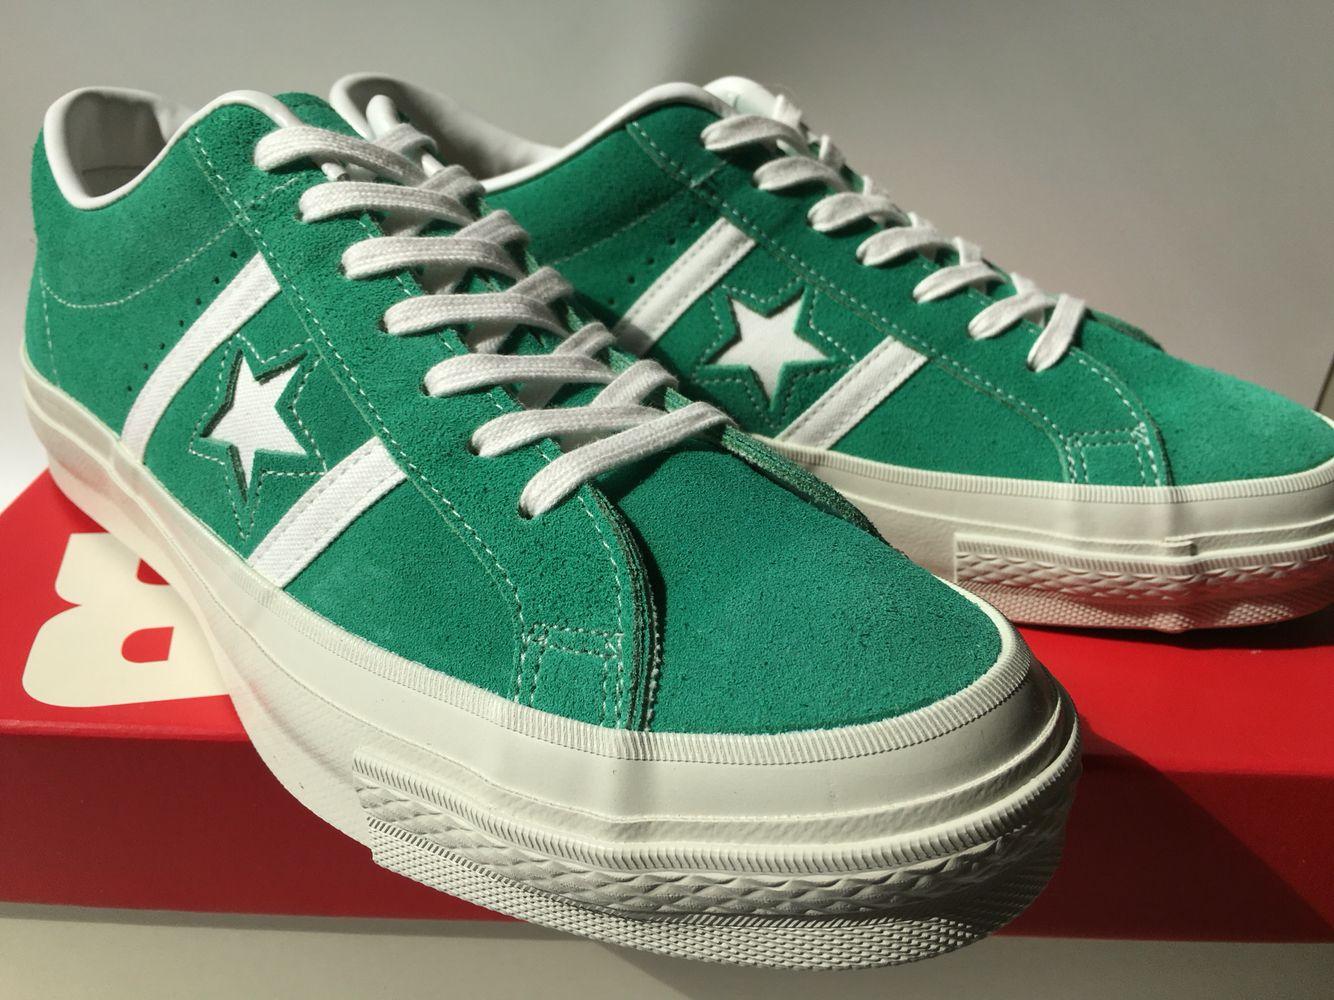 converse shoes tyler the creator lyrics splatter art artist